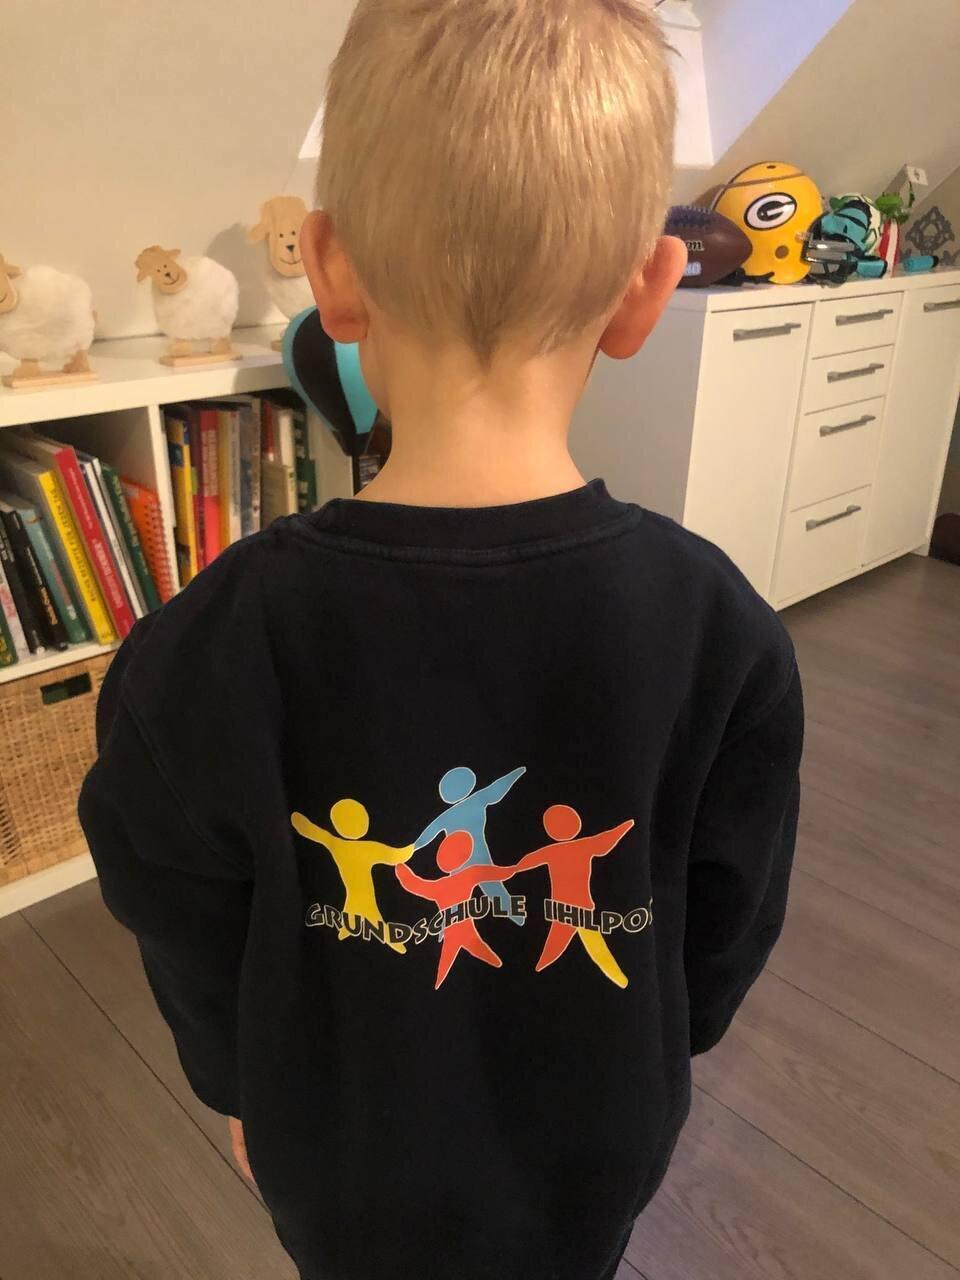 Sweater mit Schullogo